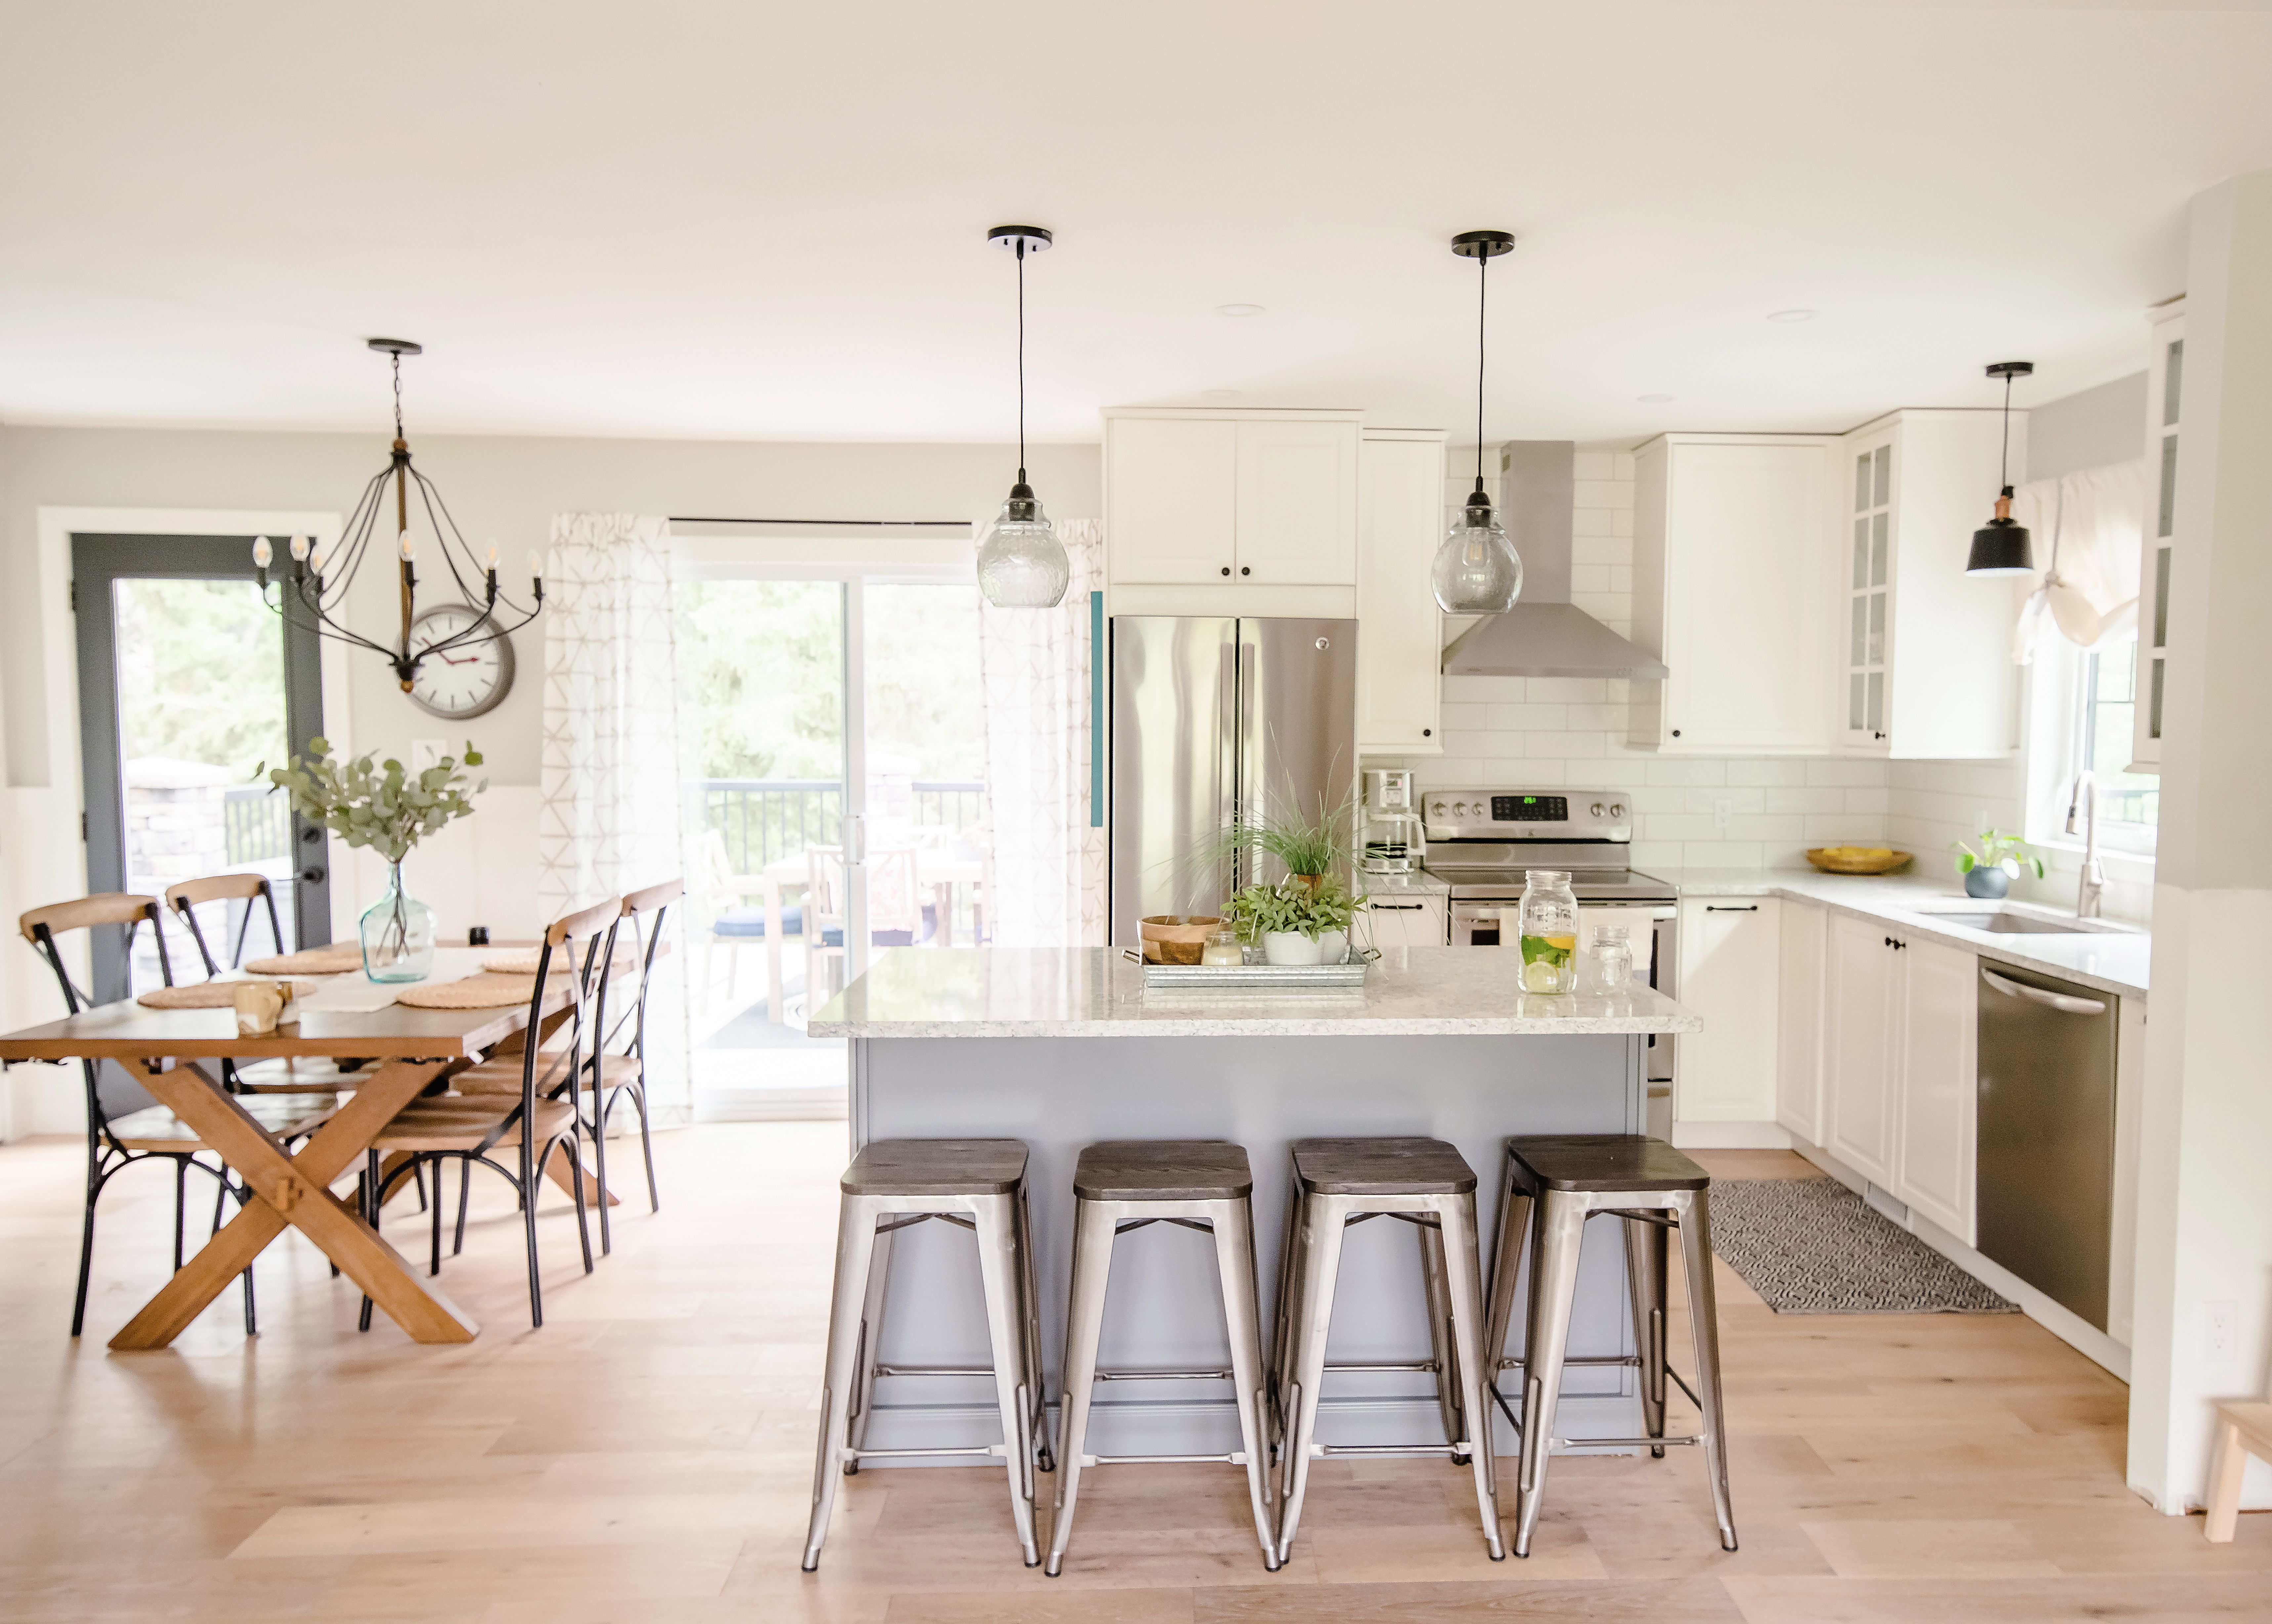 IKEA Kitchen Maximizes Space, Style and Storage Ikea